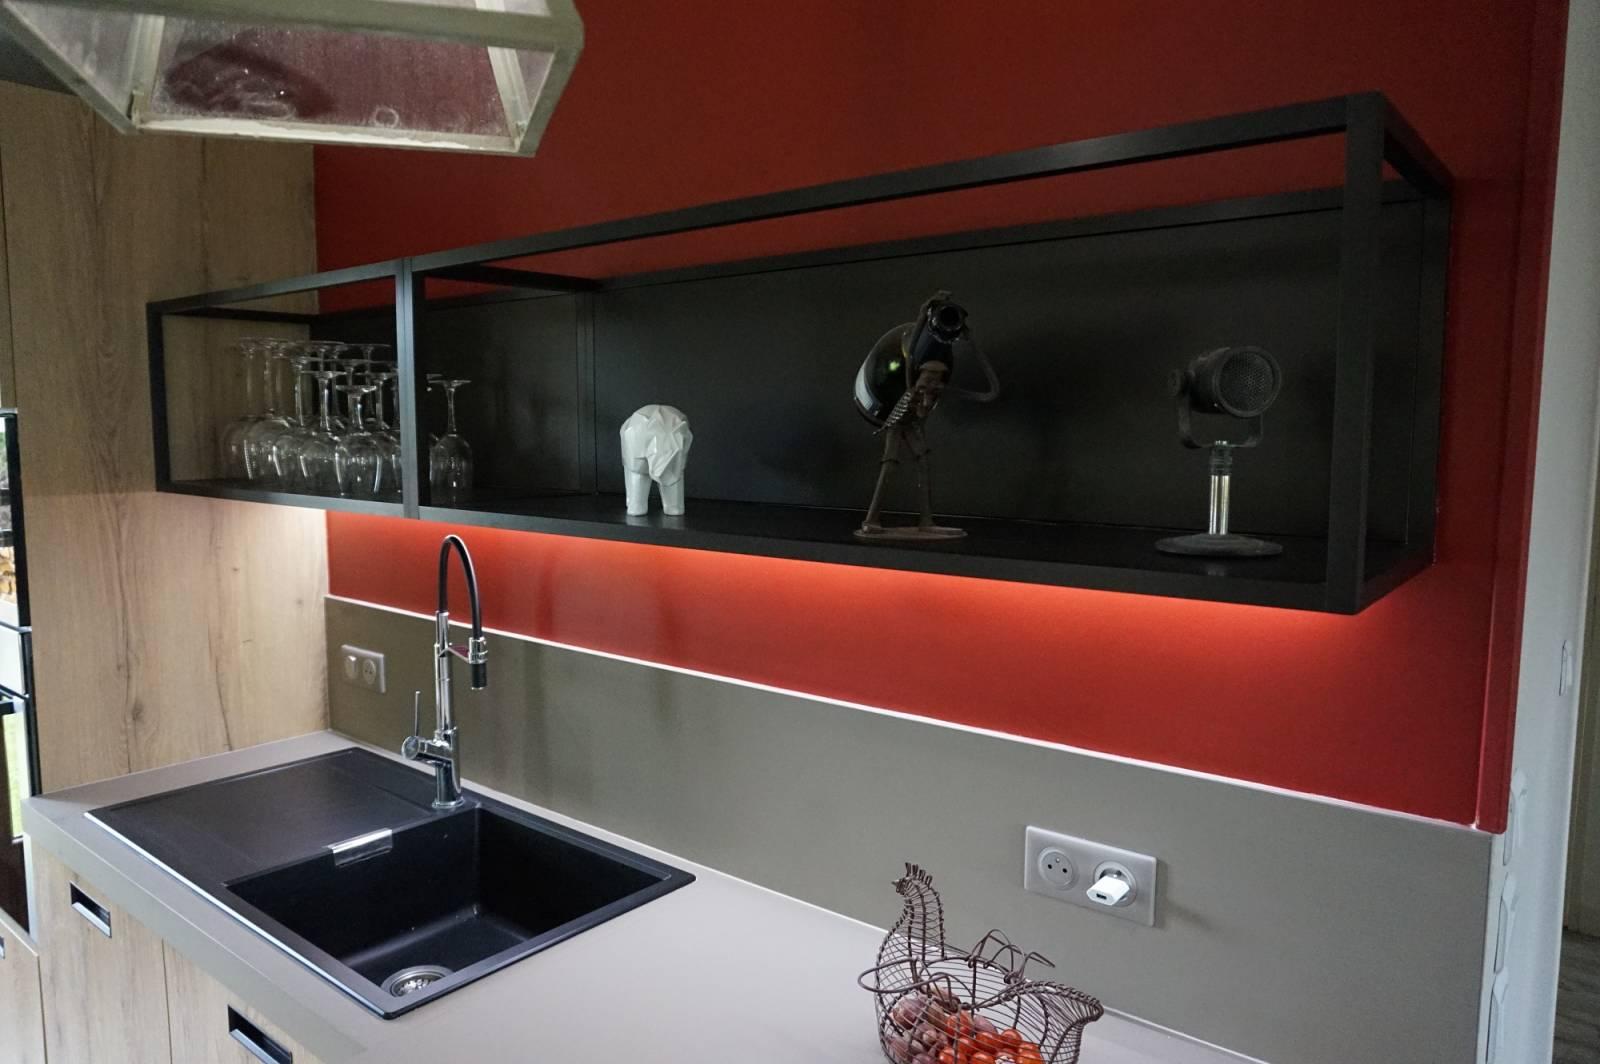 vente et pose cuisine ouverte le havre odyss e. Black Bedroom Furniture Sets. Home Design Ideas